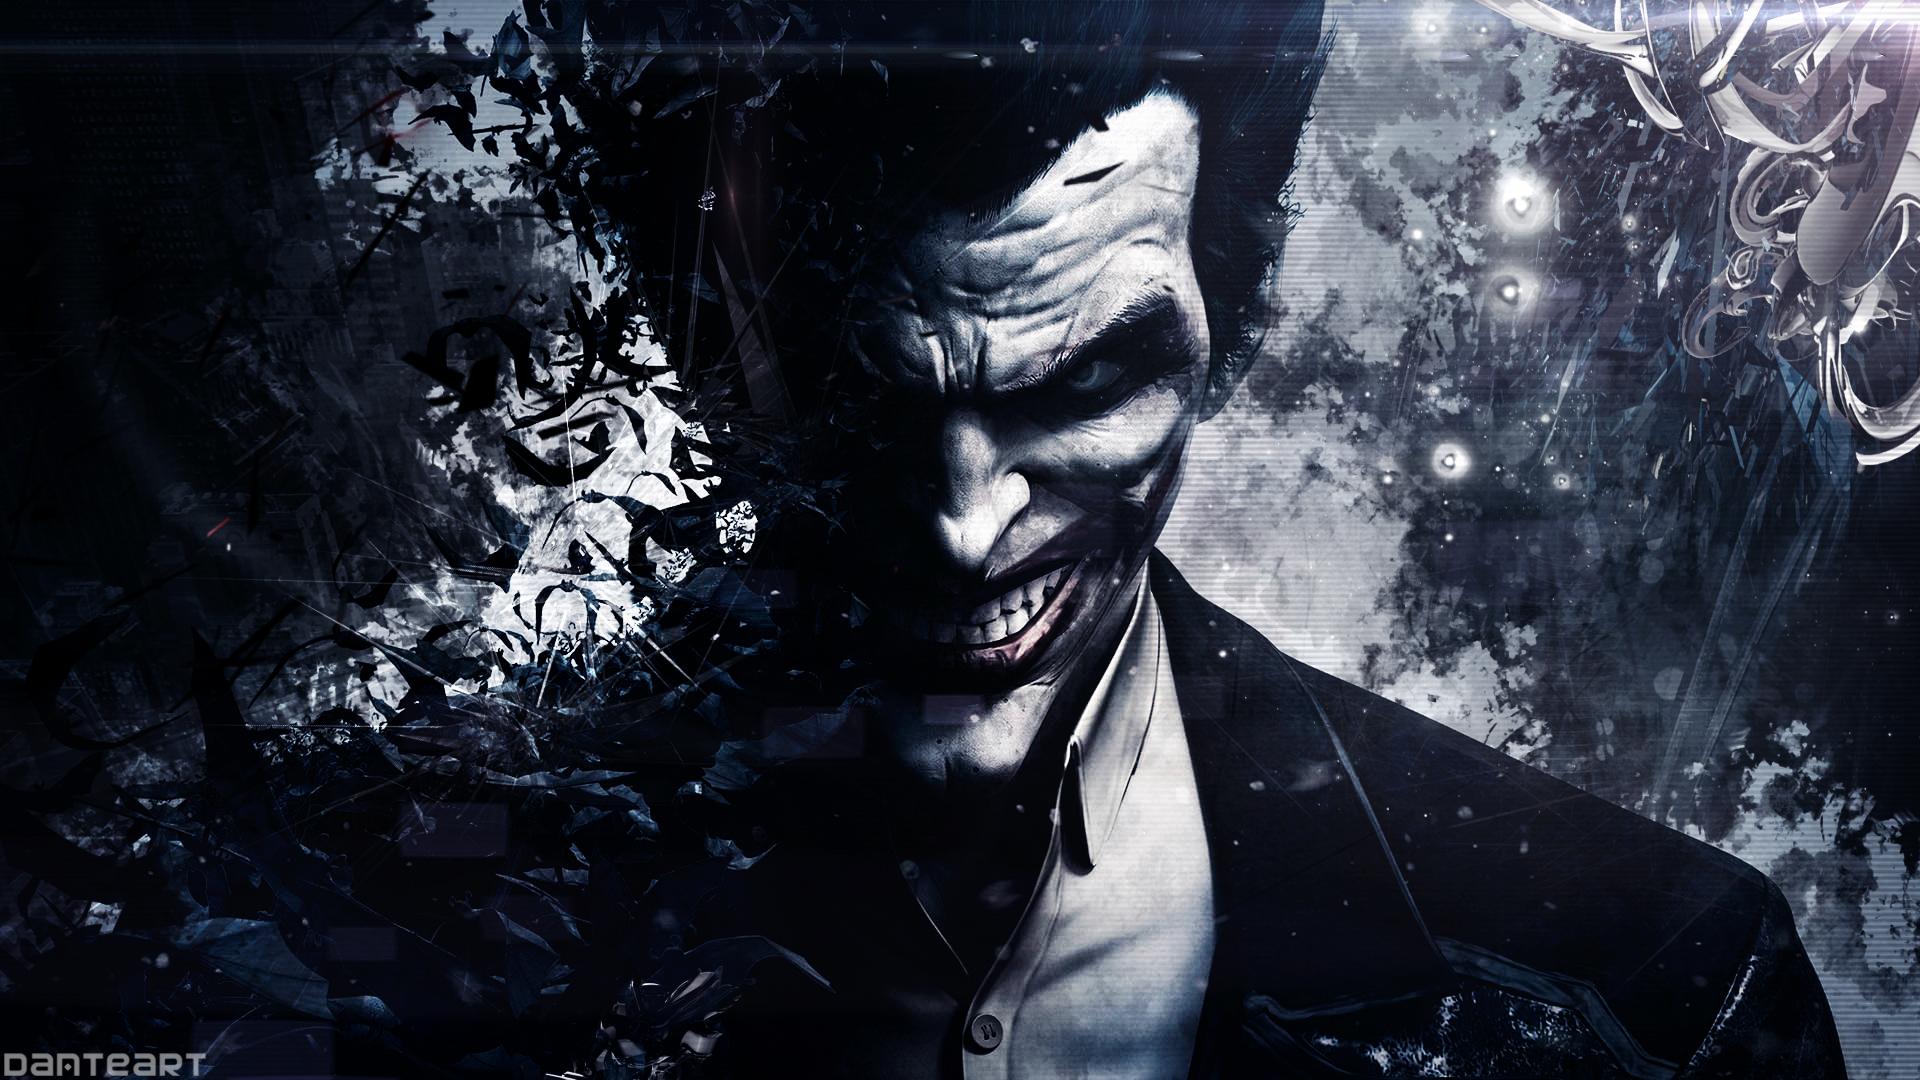 Batman Arkham Origins Joker wallpaper   1303336 1920x1080